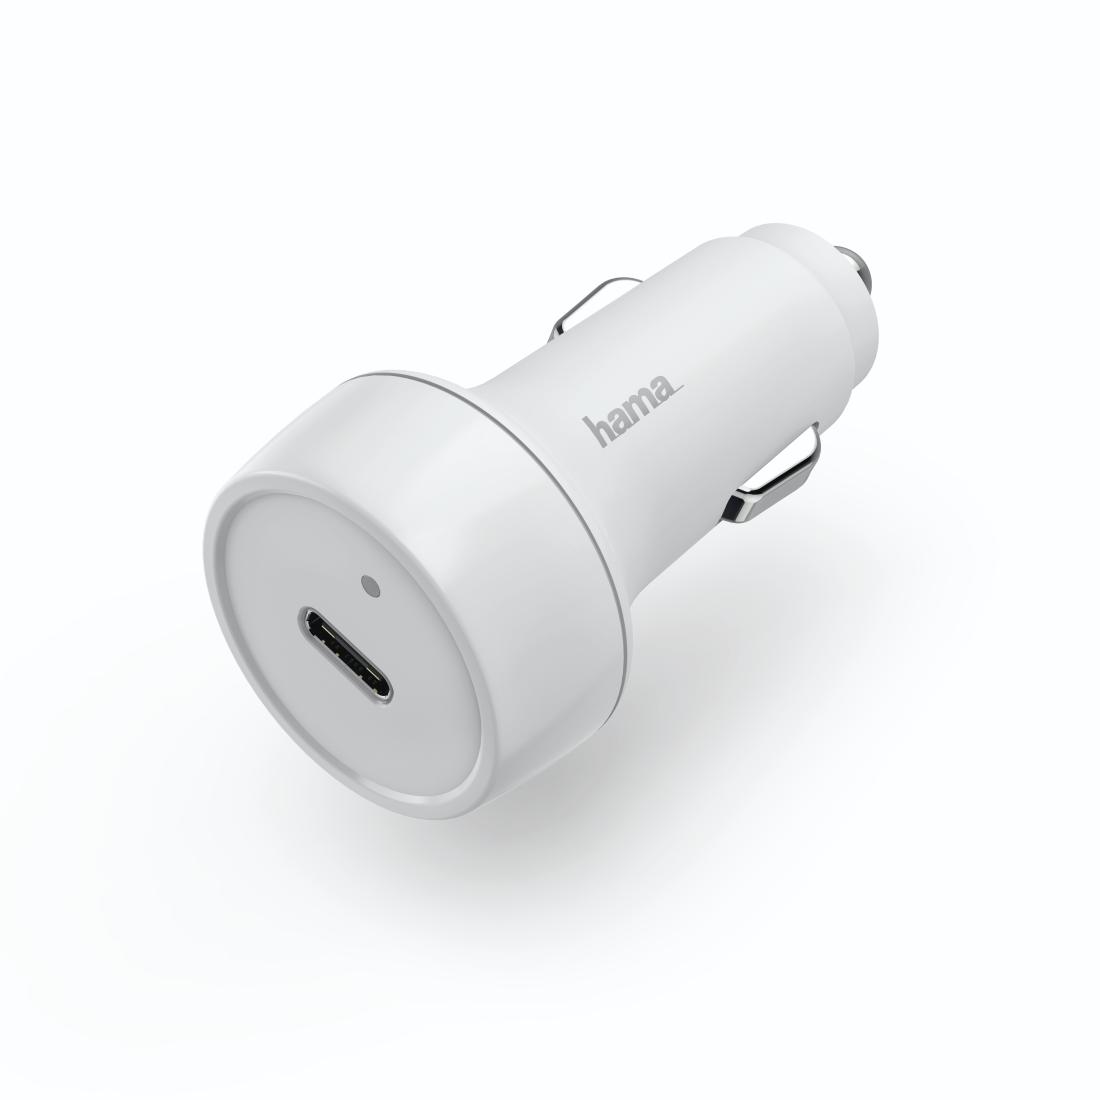 Hama Kfz Ladegerät, USB C, Power Delivery PD Qualcomm®+USB A